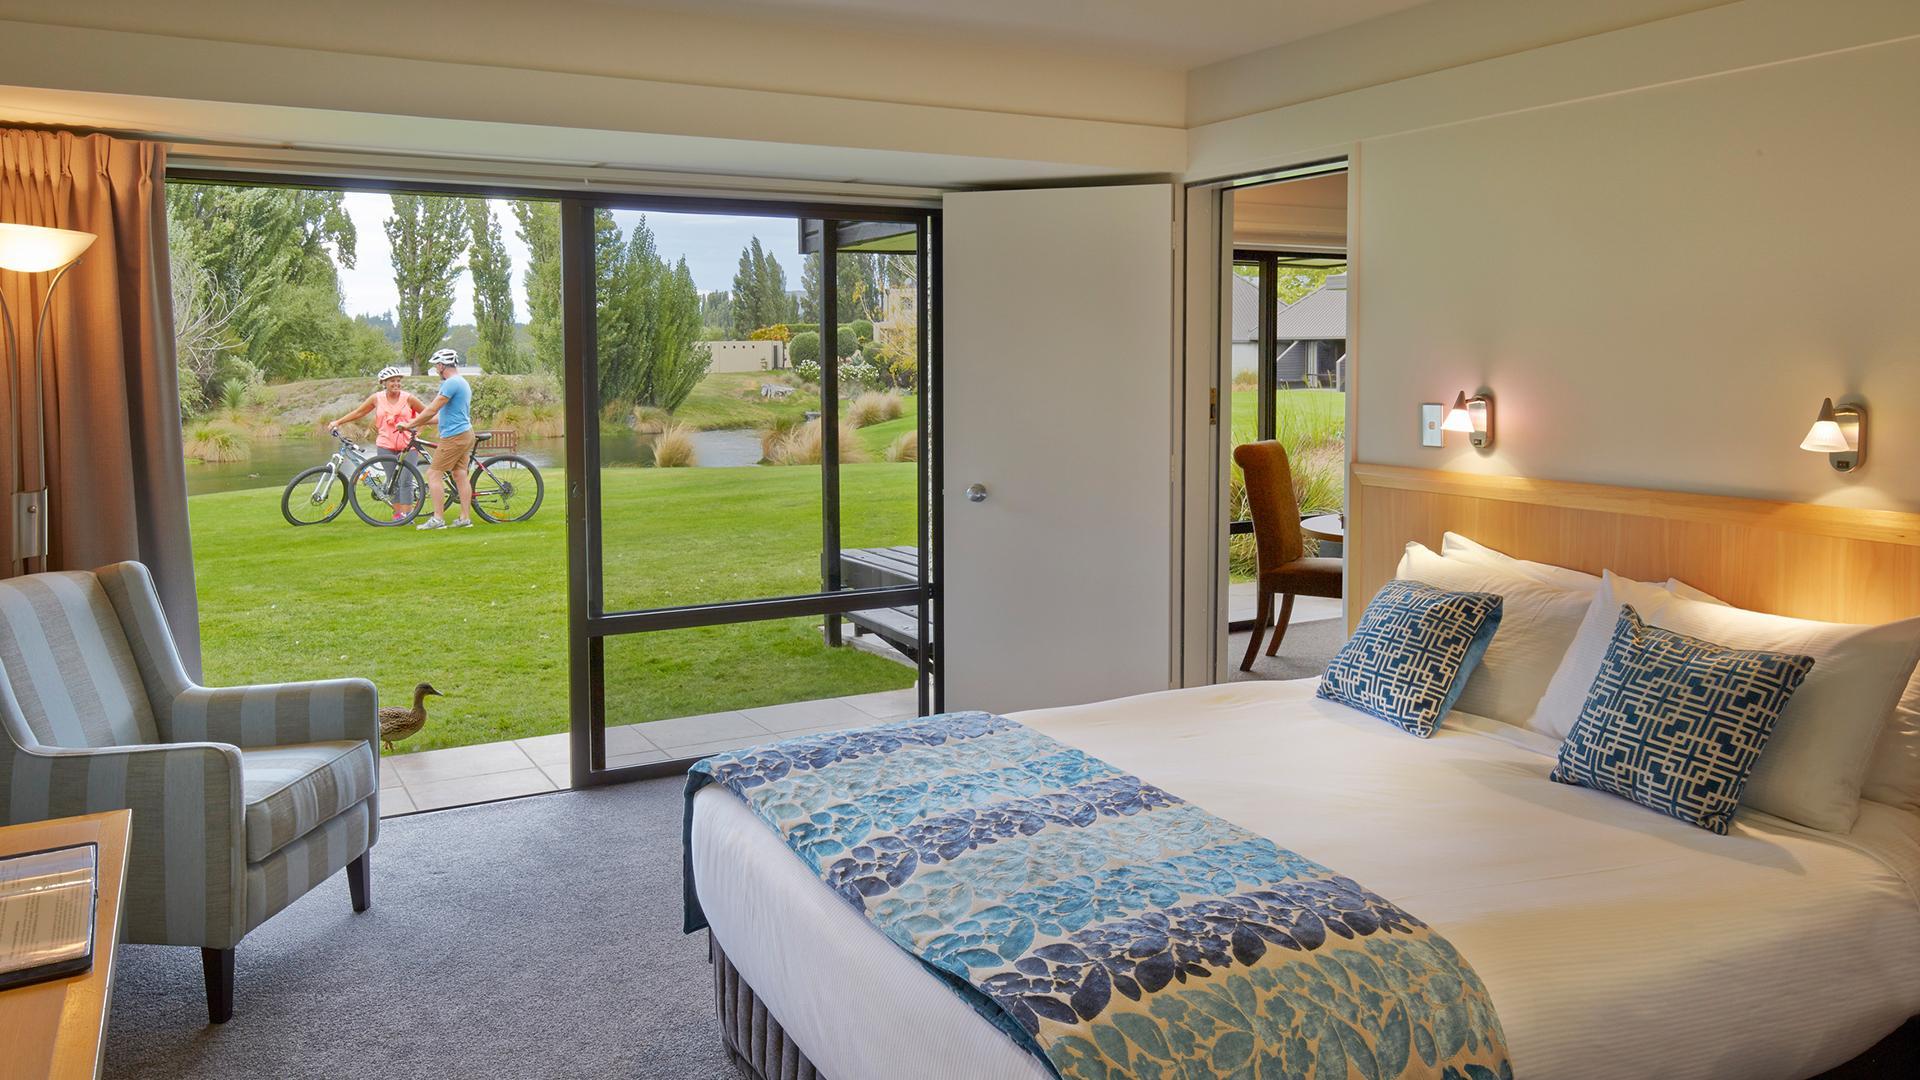 Lake View Hotel Room - Aug 20 image 1 at Edgewater Lake Wanaka by null, Otago, New Zealand